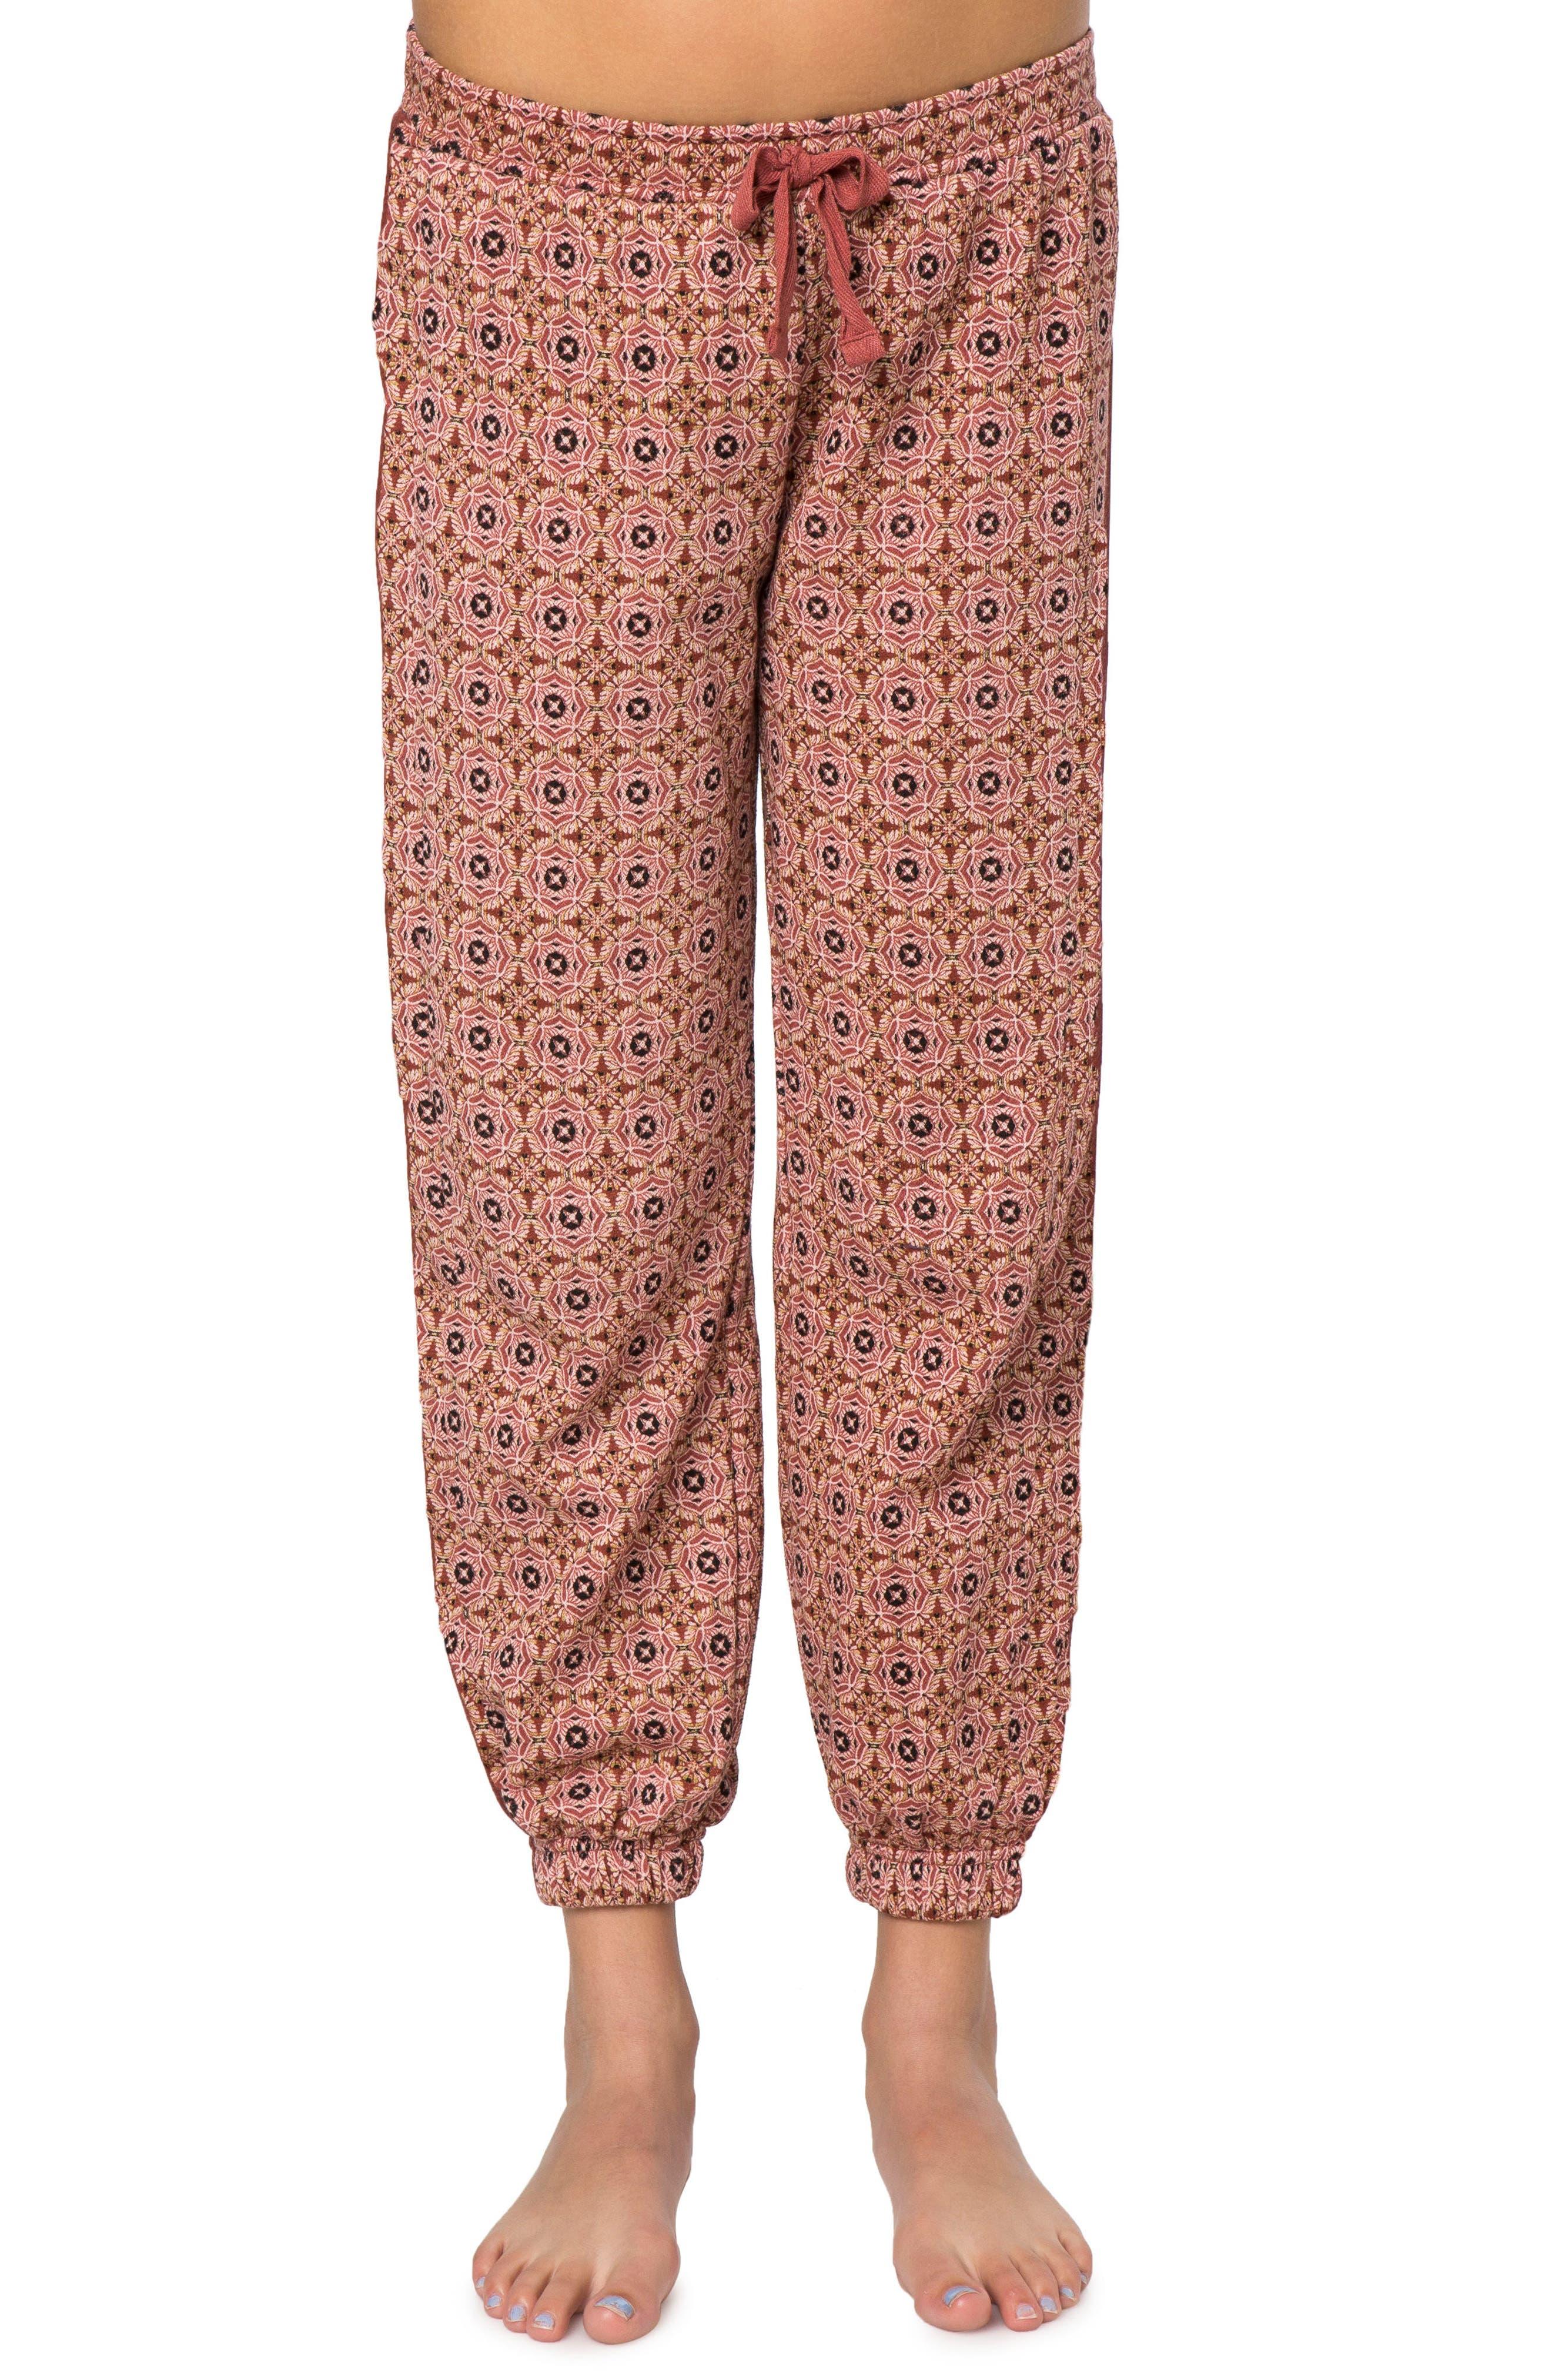 Sasha Fleece Jogger Pants,                         Main,                         color, Red Multi Color